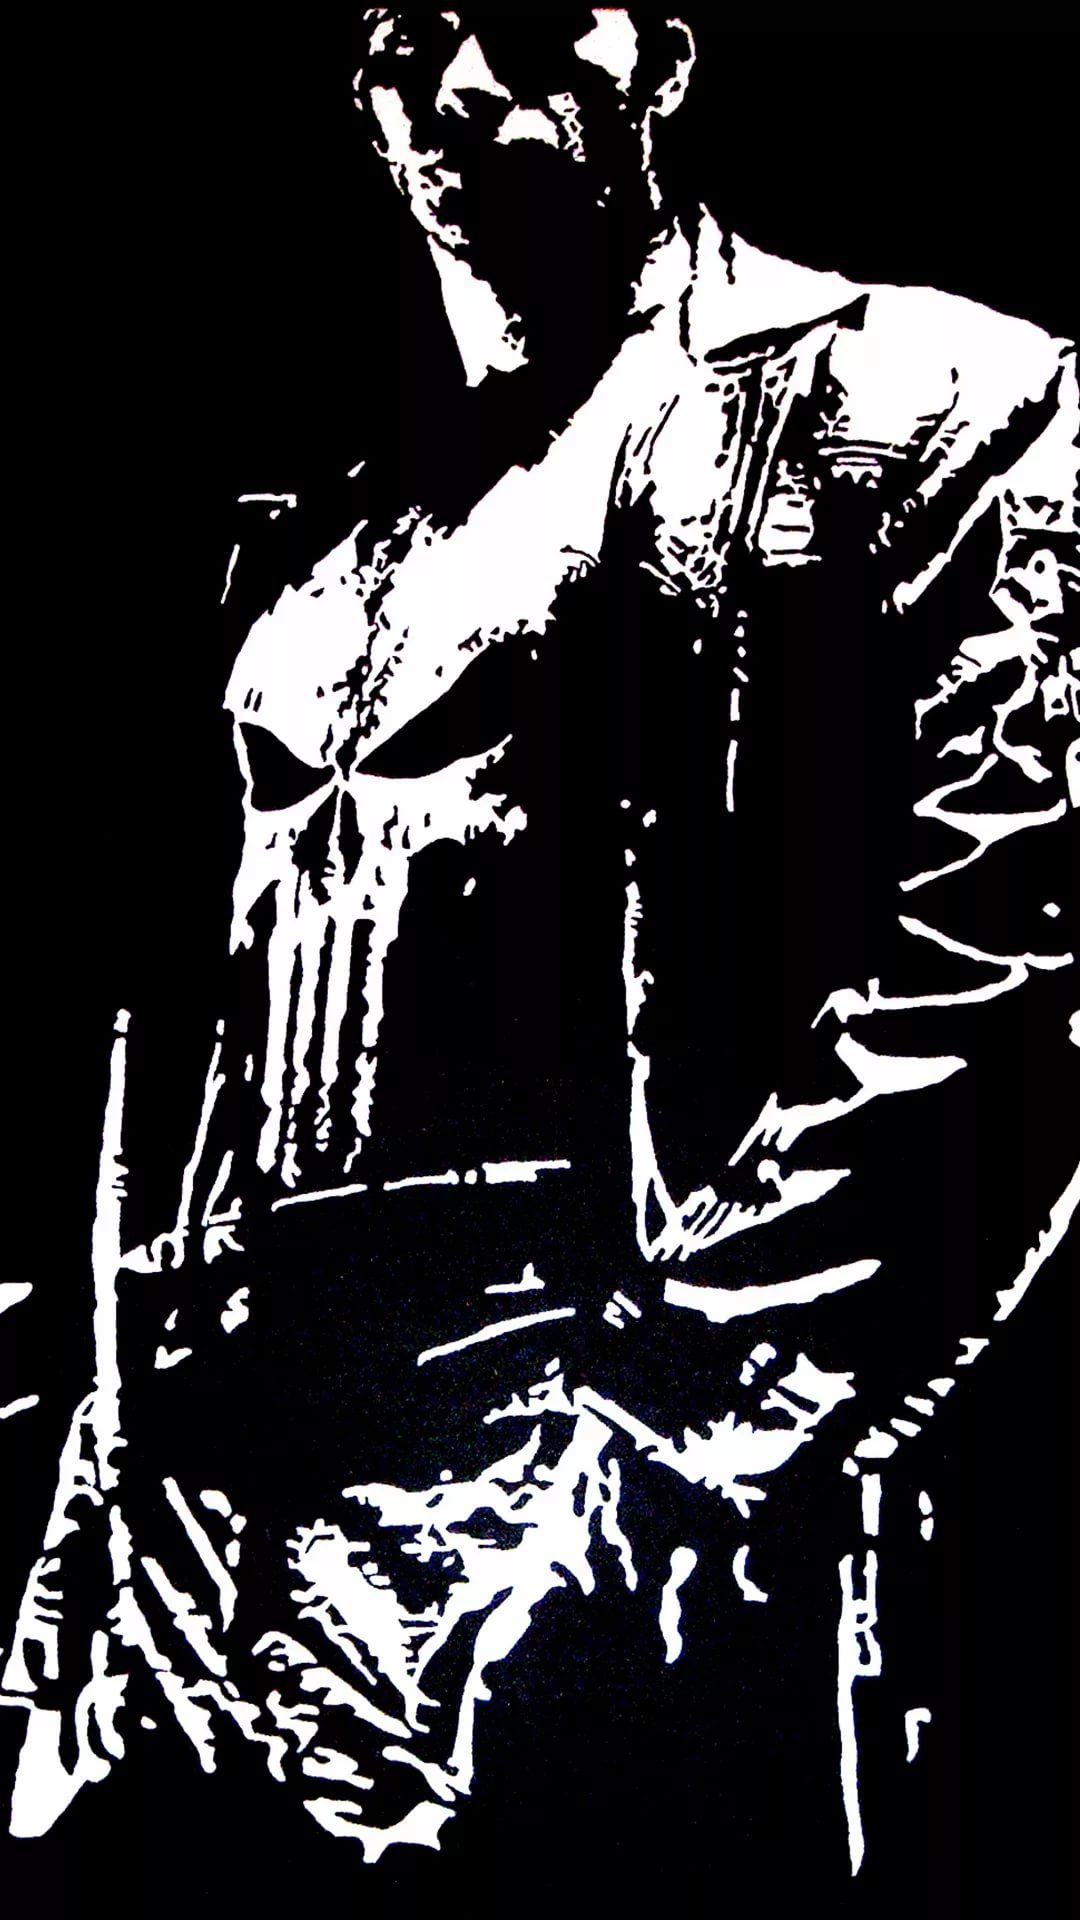 Punisher iPhone 6 wallpaper